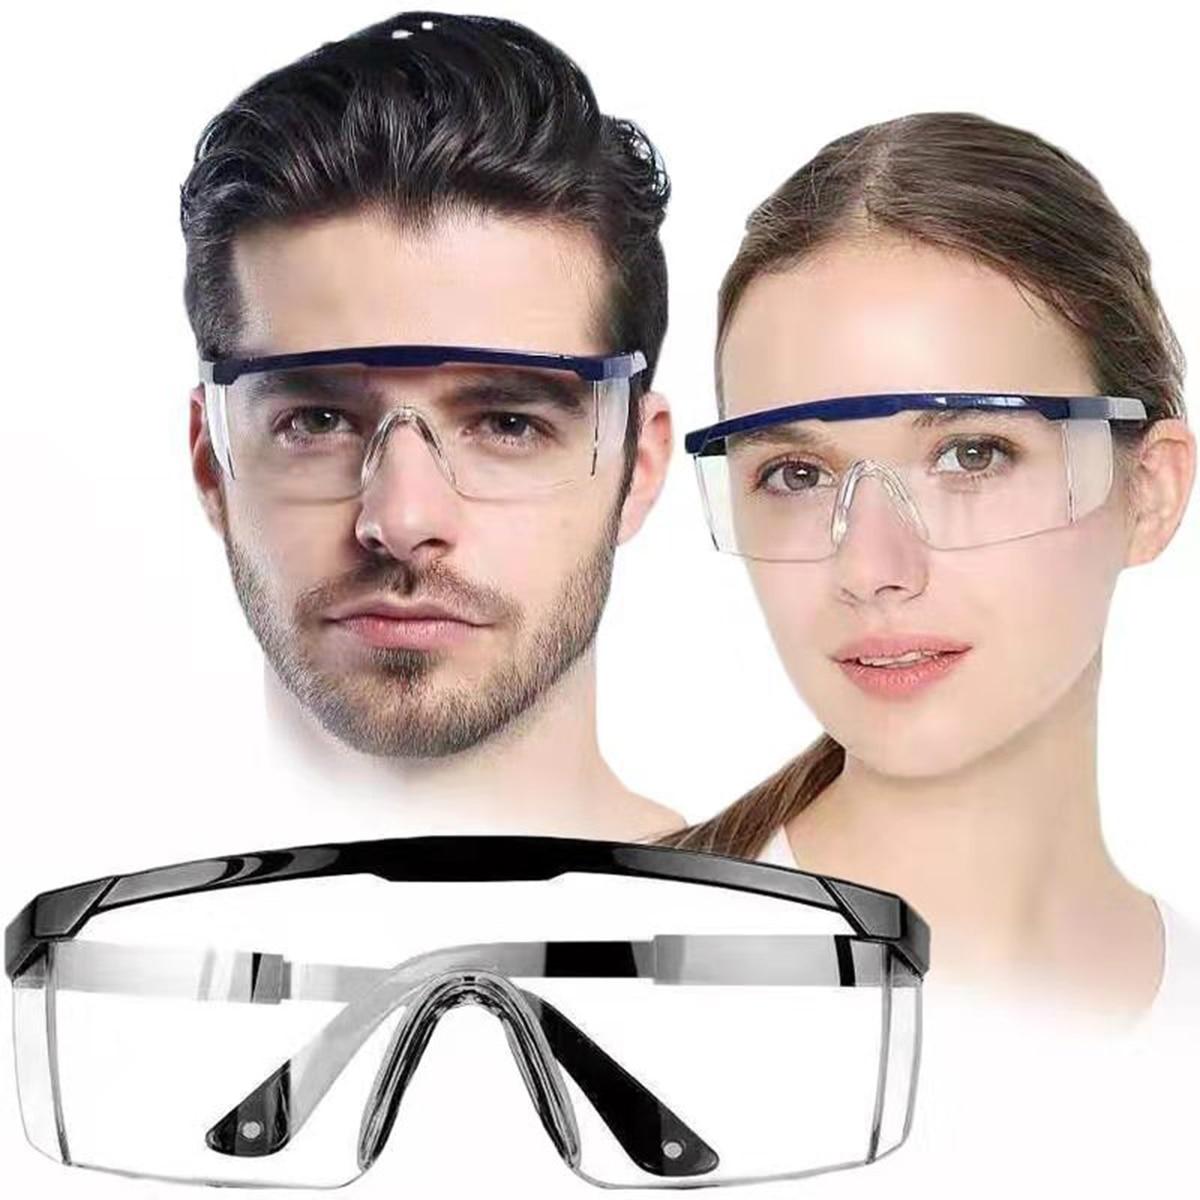 NEW Dustproof Spit Saliva Goggles Safety Glasses Anti-dust Anti Fog